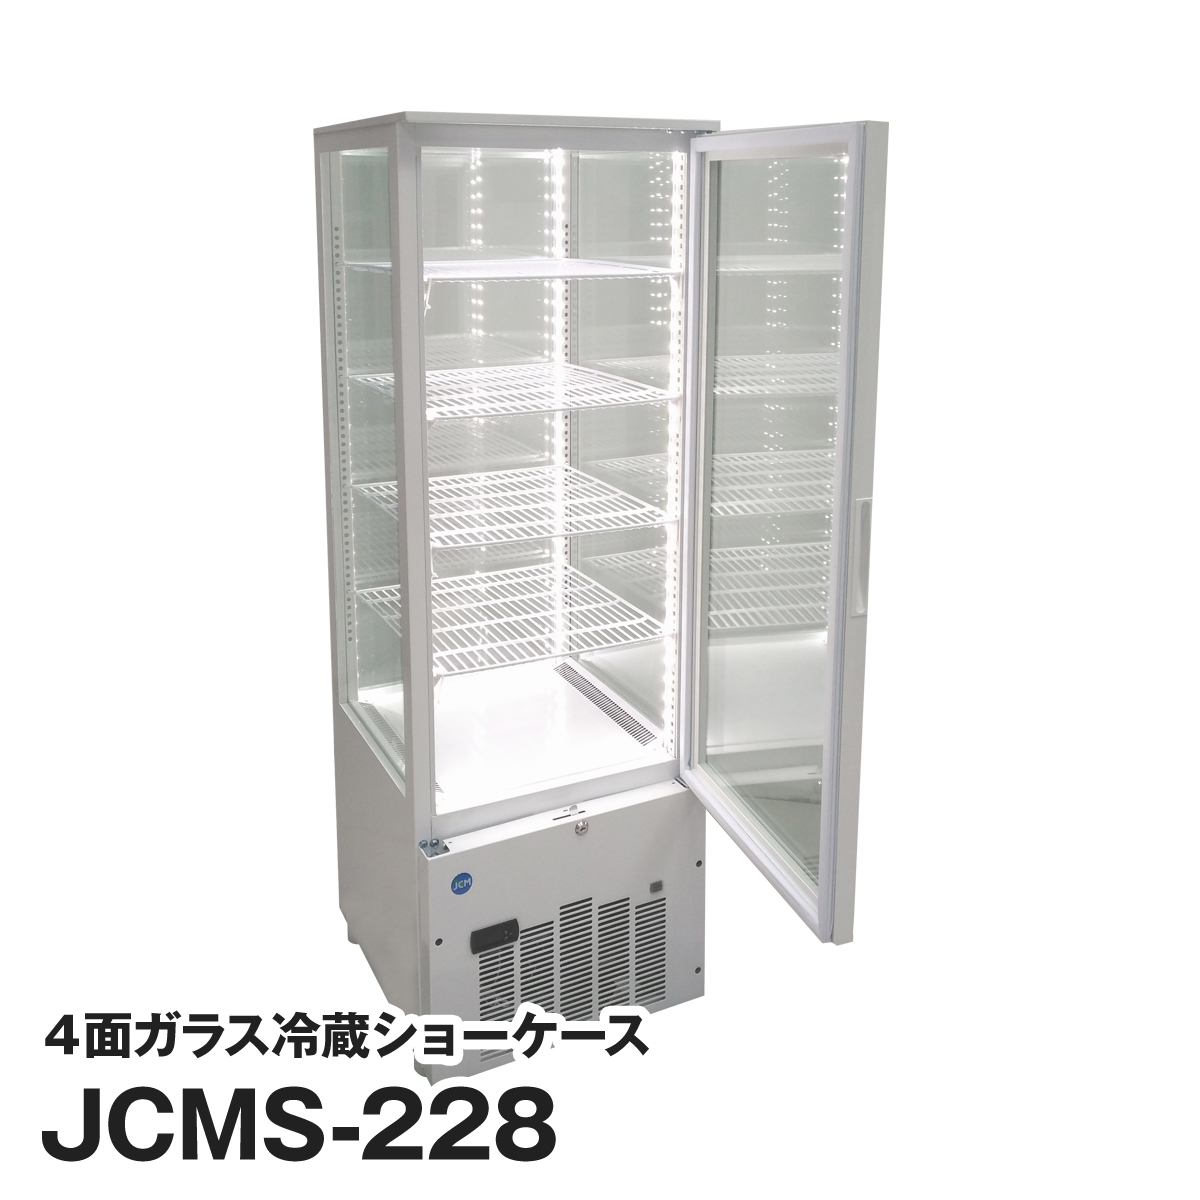 JCM社製 業務用 保冷庫 冷蔵庫 228L 4面 ガラス 冷蔵 ショーケース JCMS-228 新品